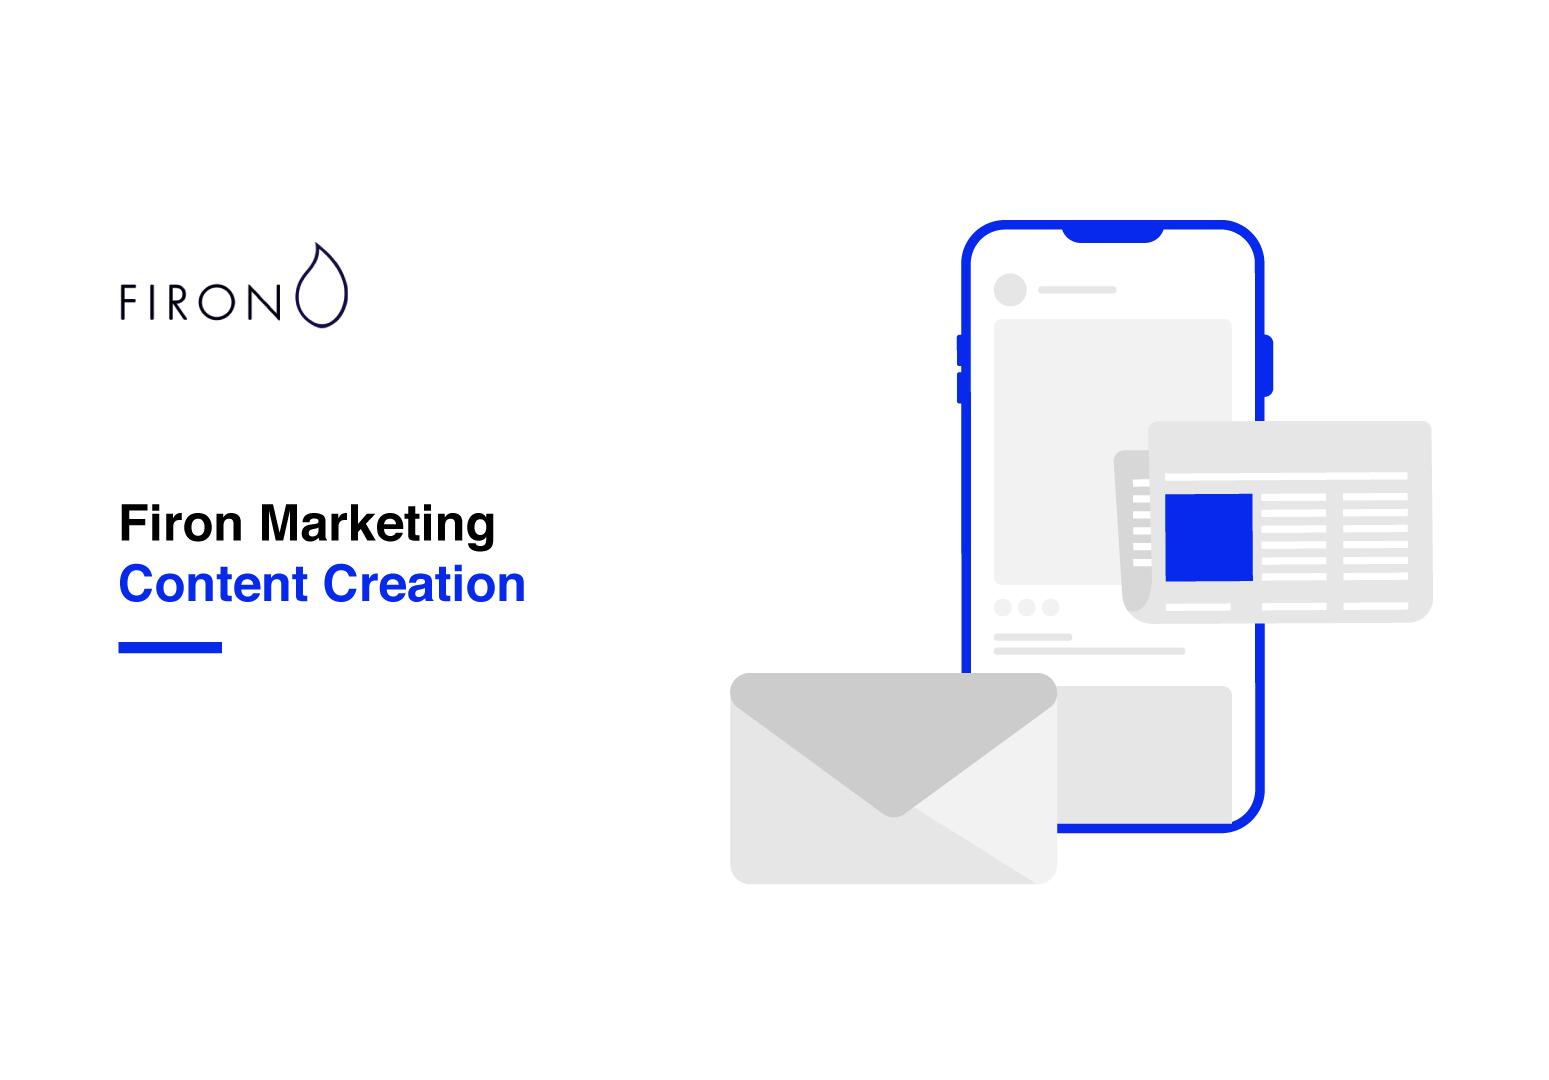 firon marketing content creation